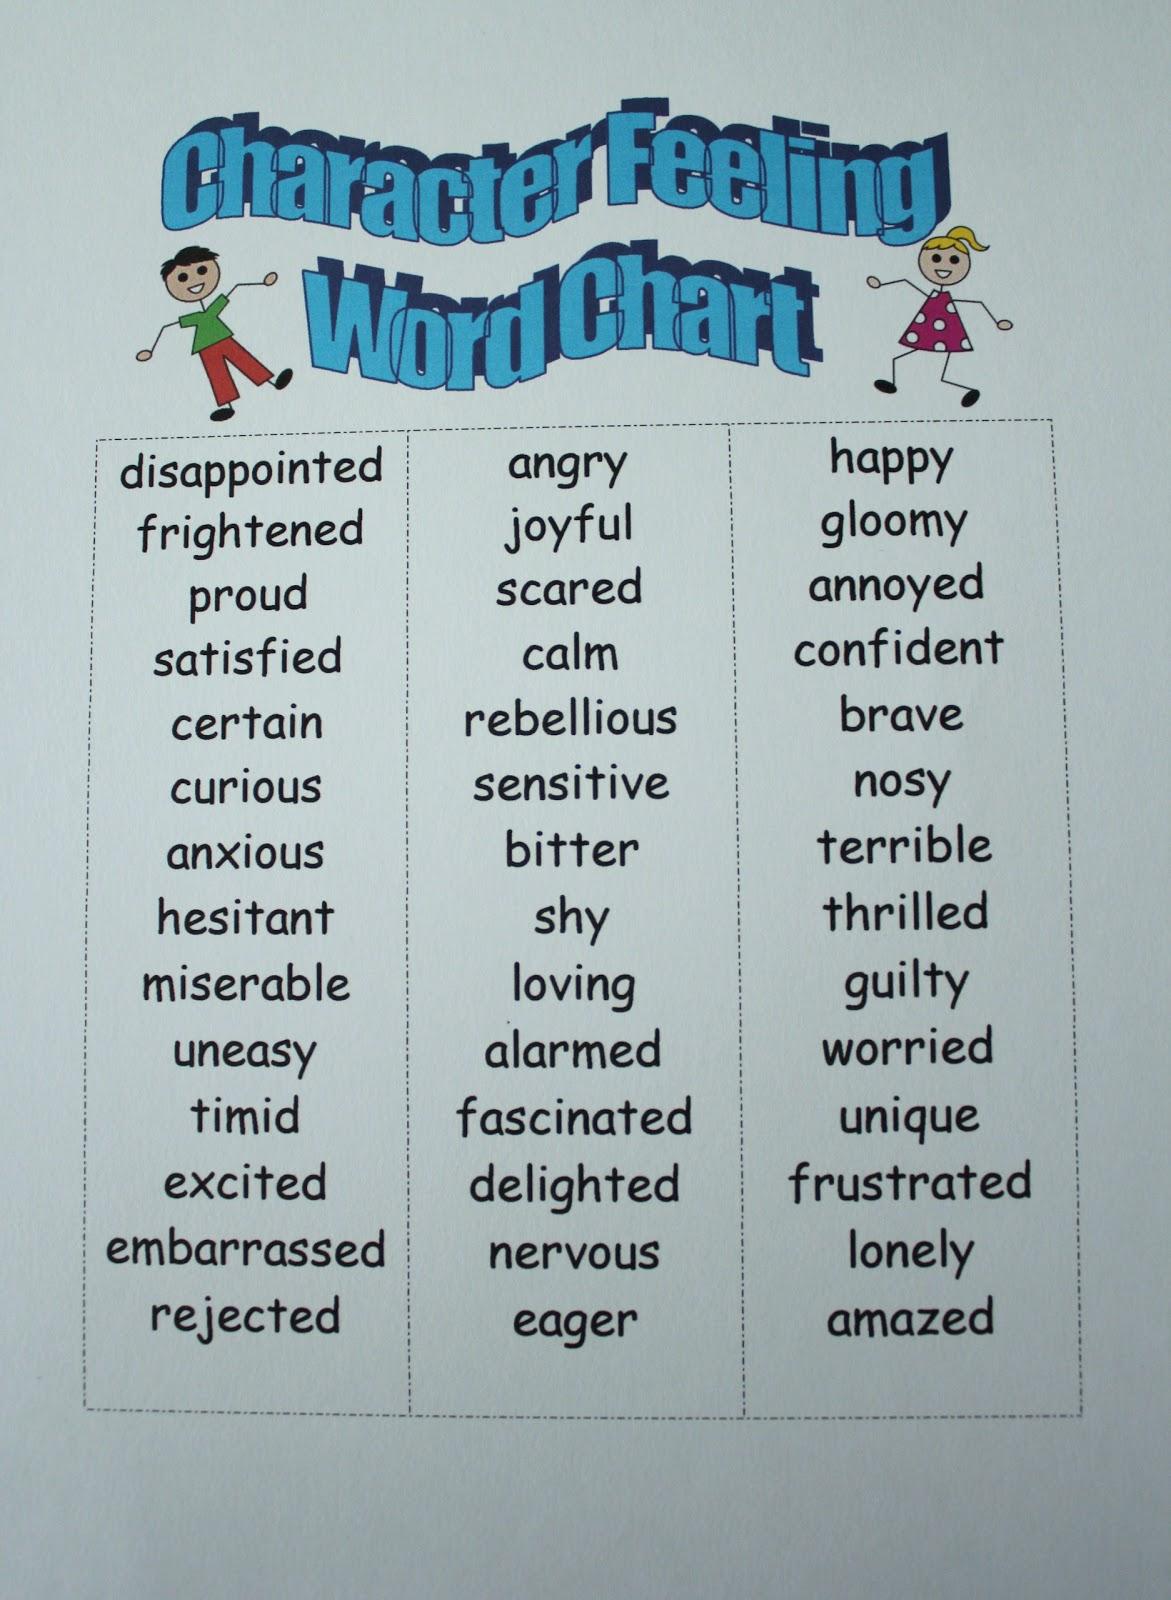 Essay words for feelings - Custom paper Example - pfhomeworkedou